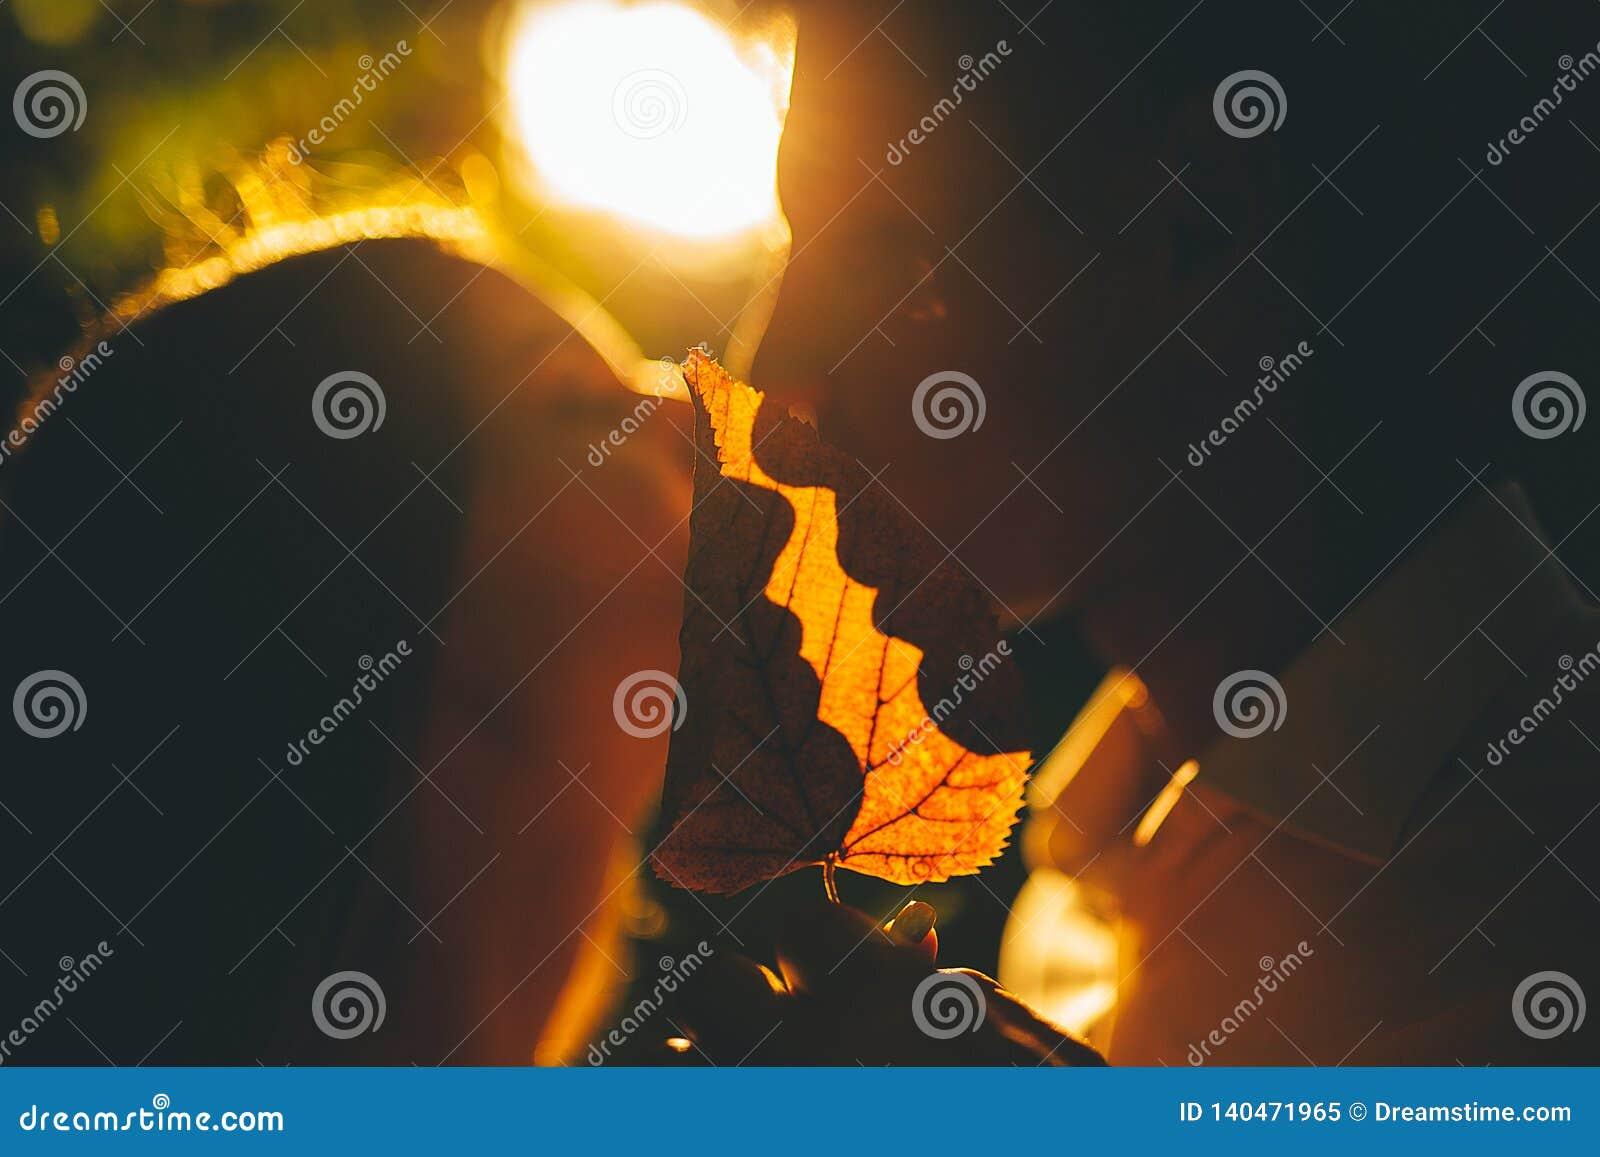 Shadow of lovers lips on yellowed sheet